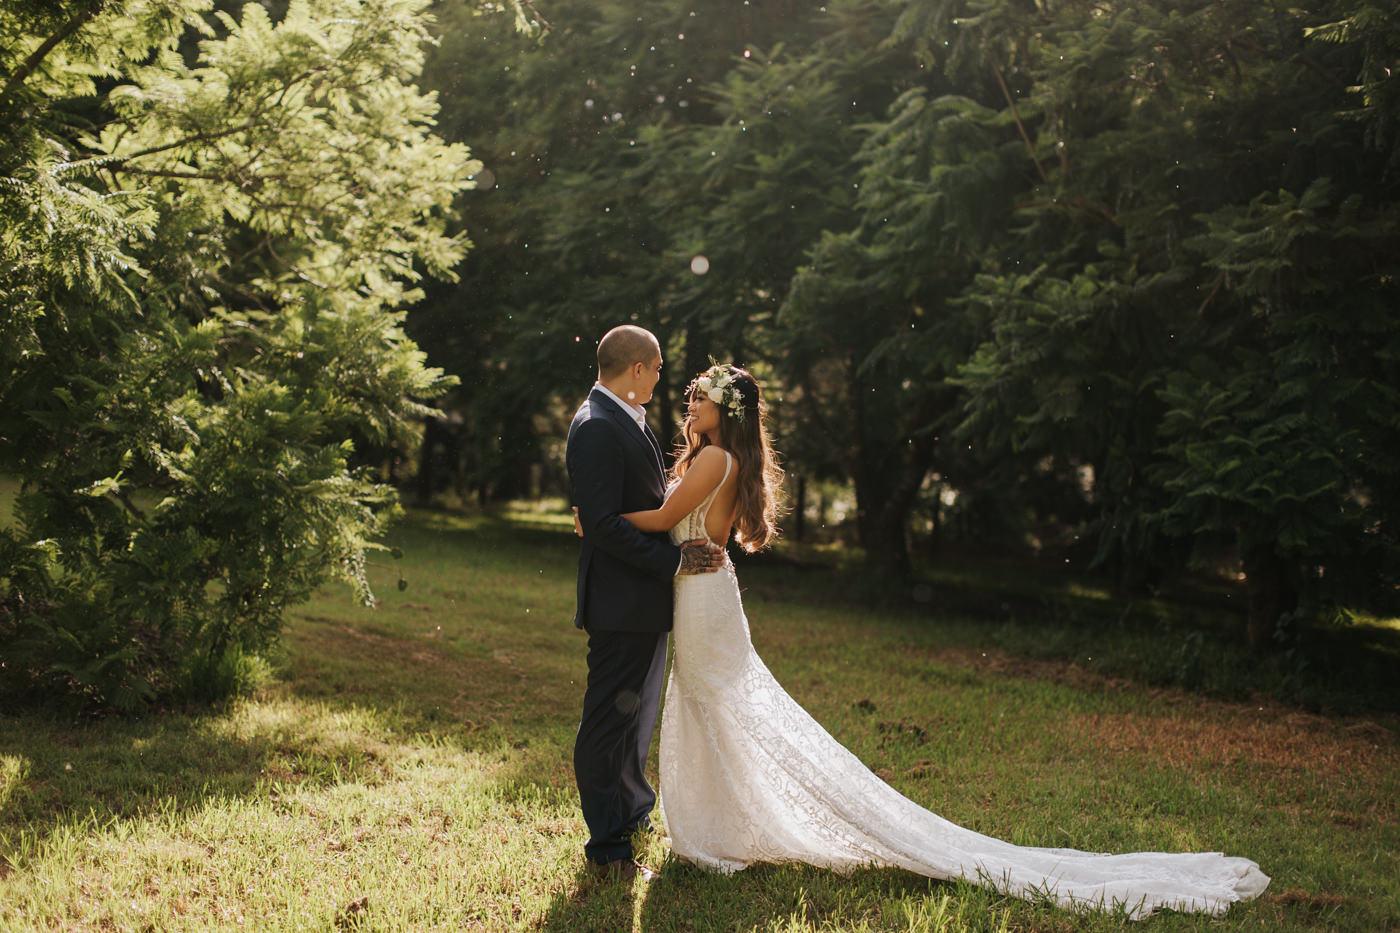 Nick & Vanezza - Fernbank Farm Wedding - Samantha Heather Photography-120.jpg